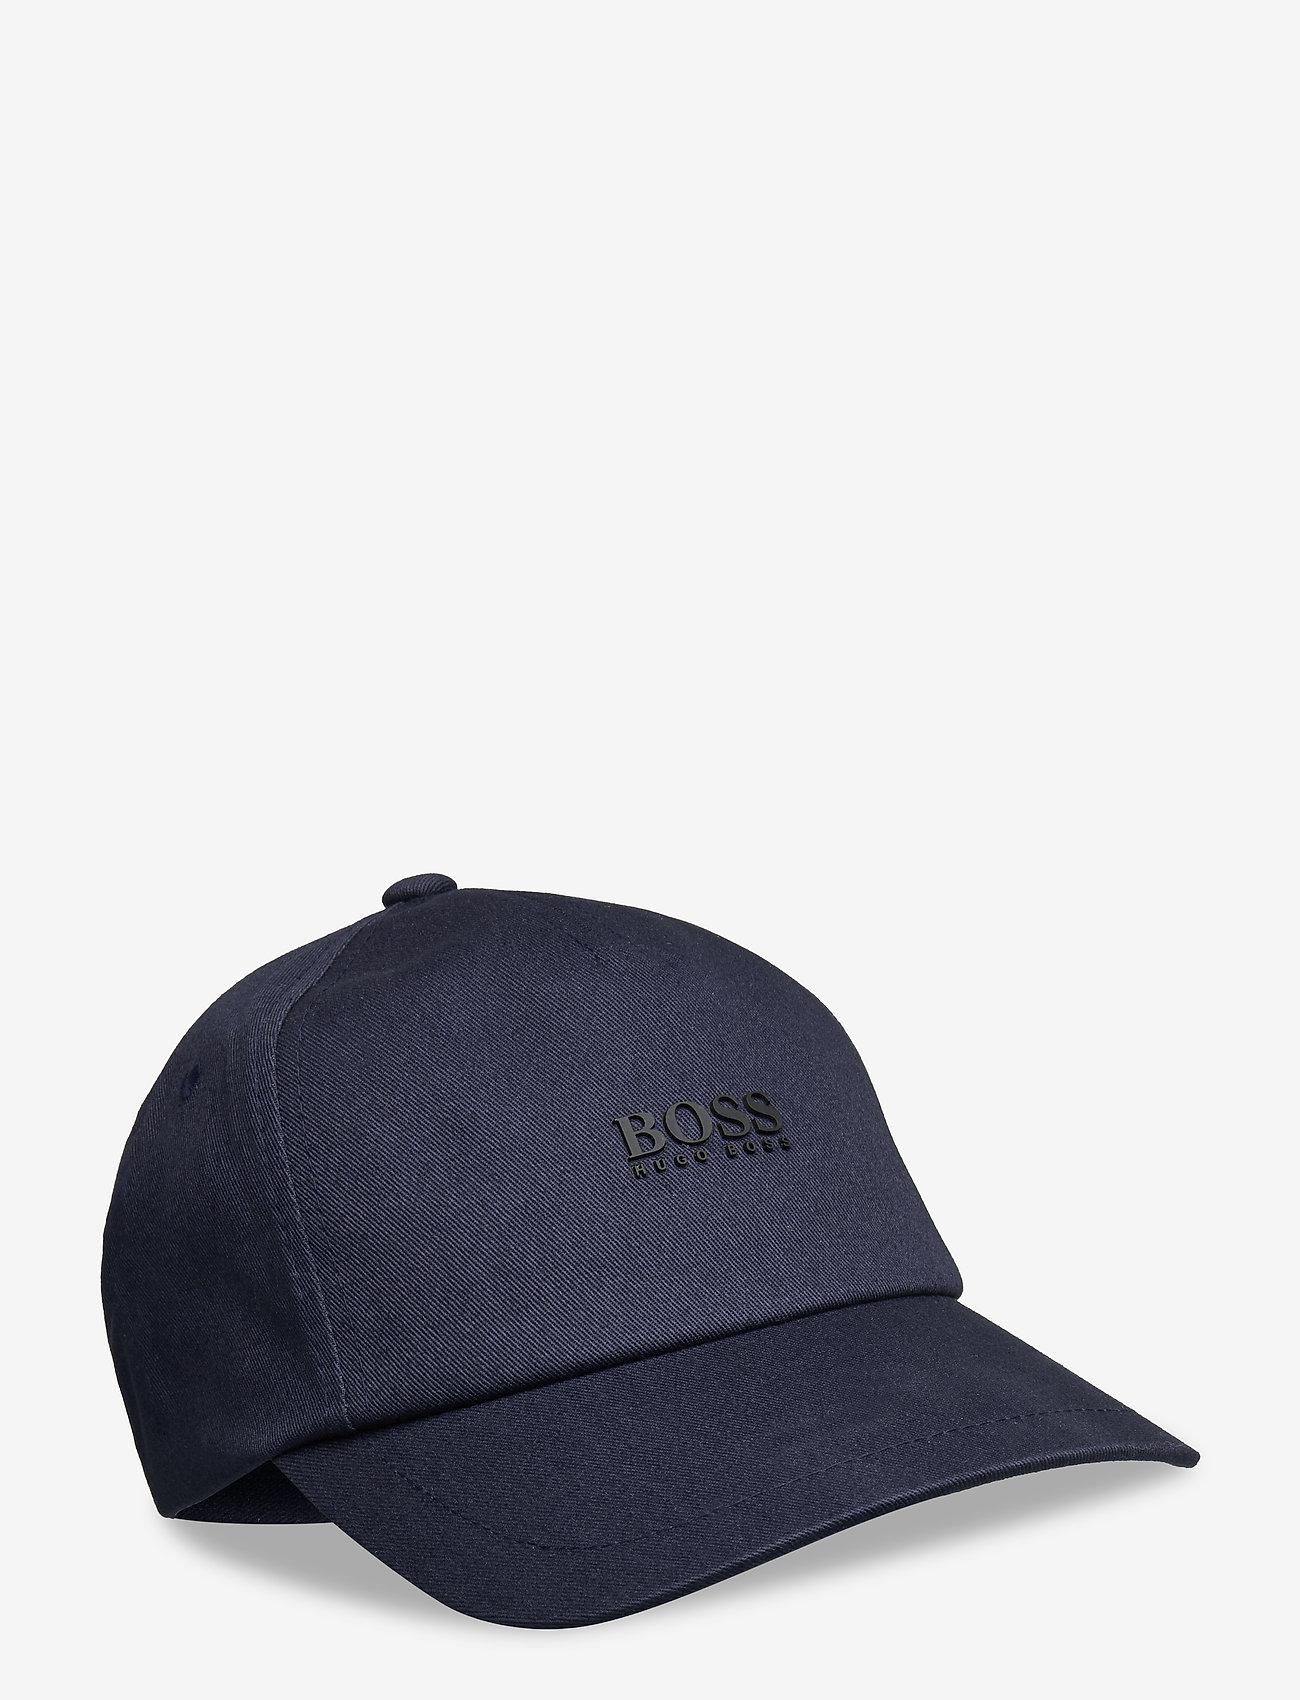 BOSS - Fresco - casquettes - dark blue - 0